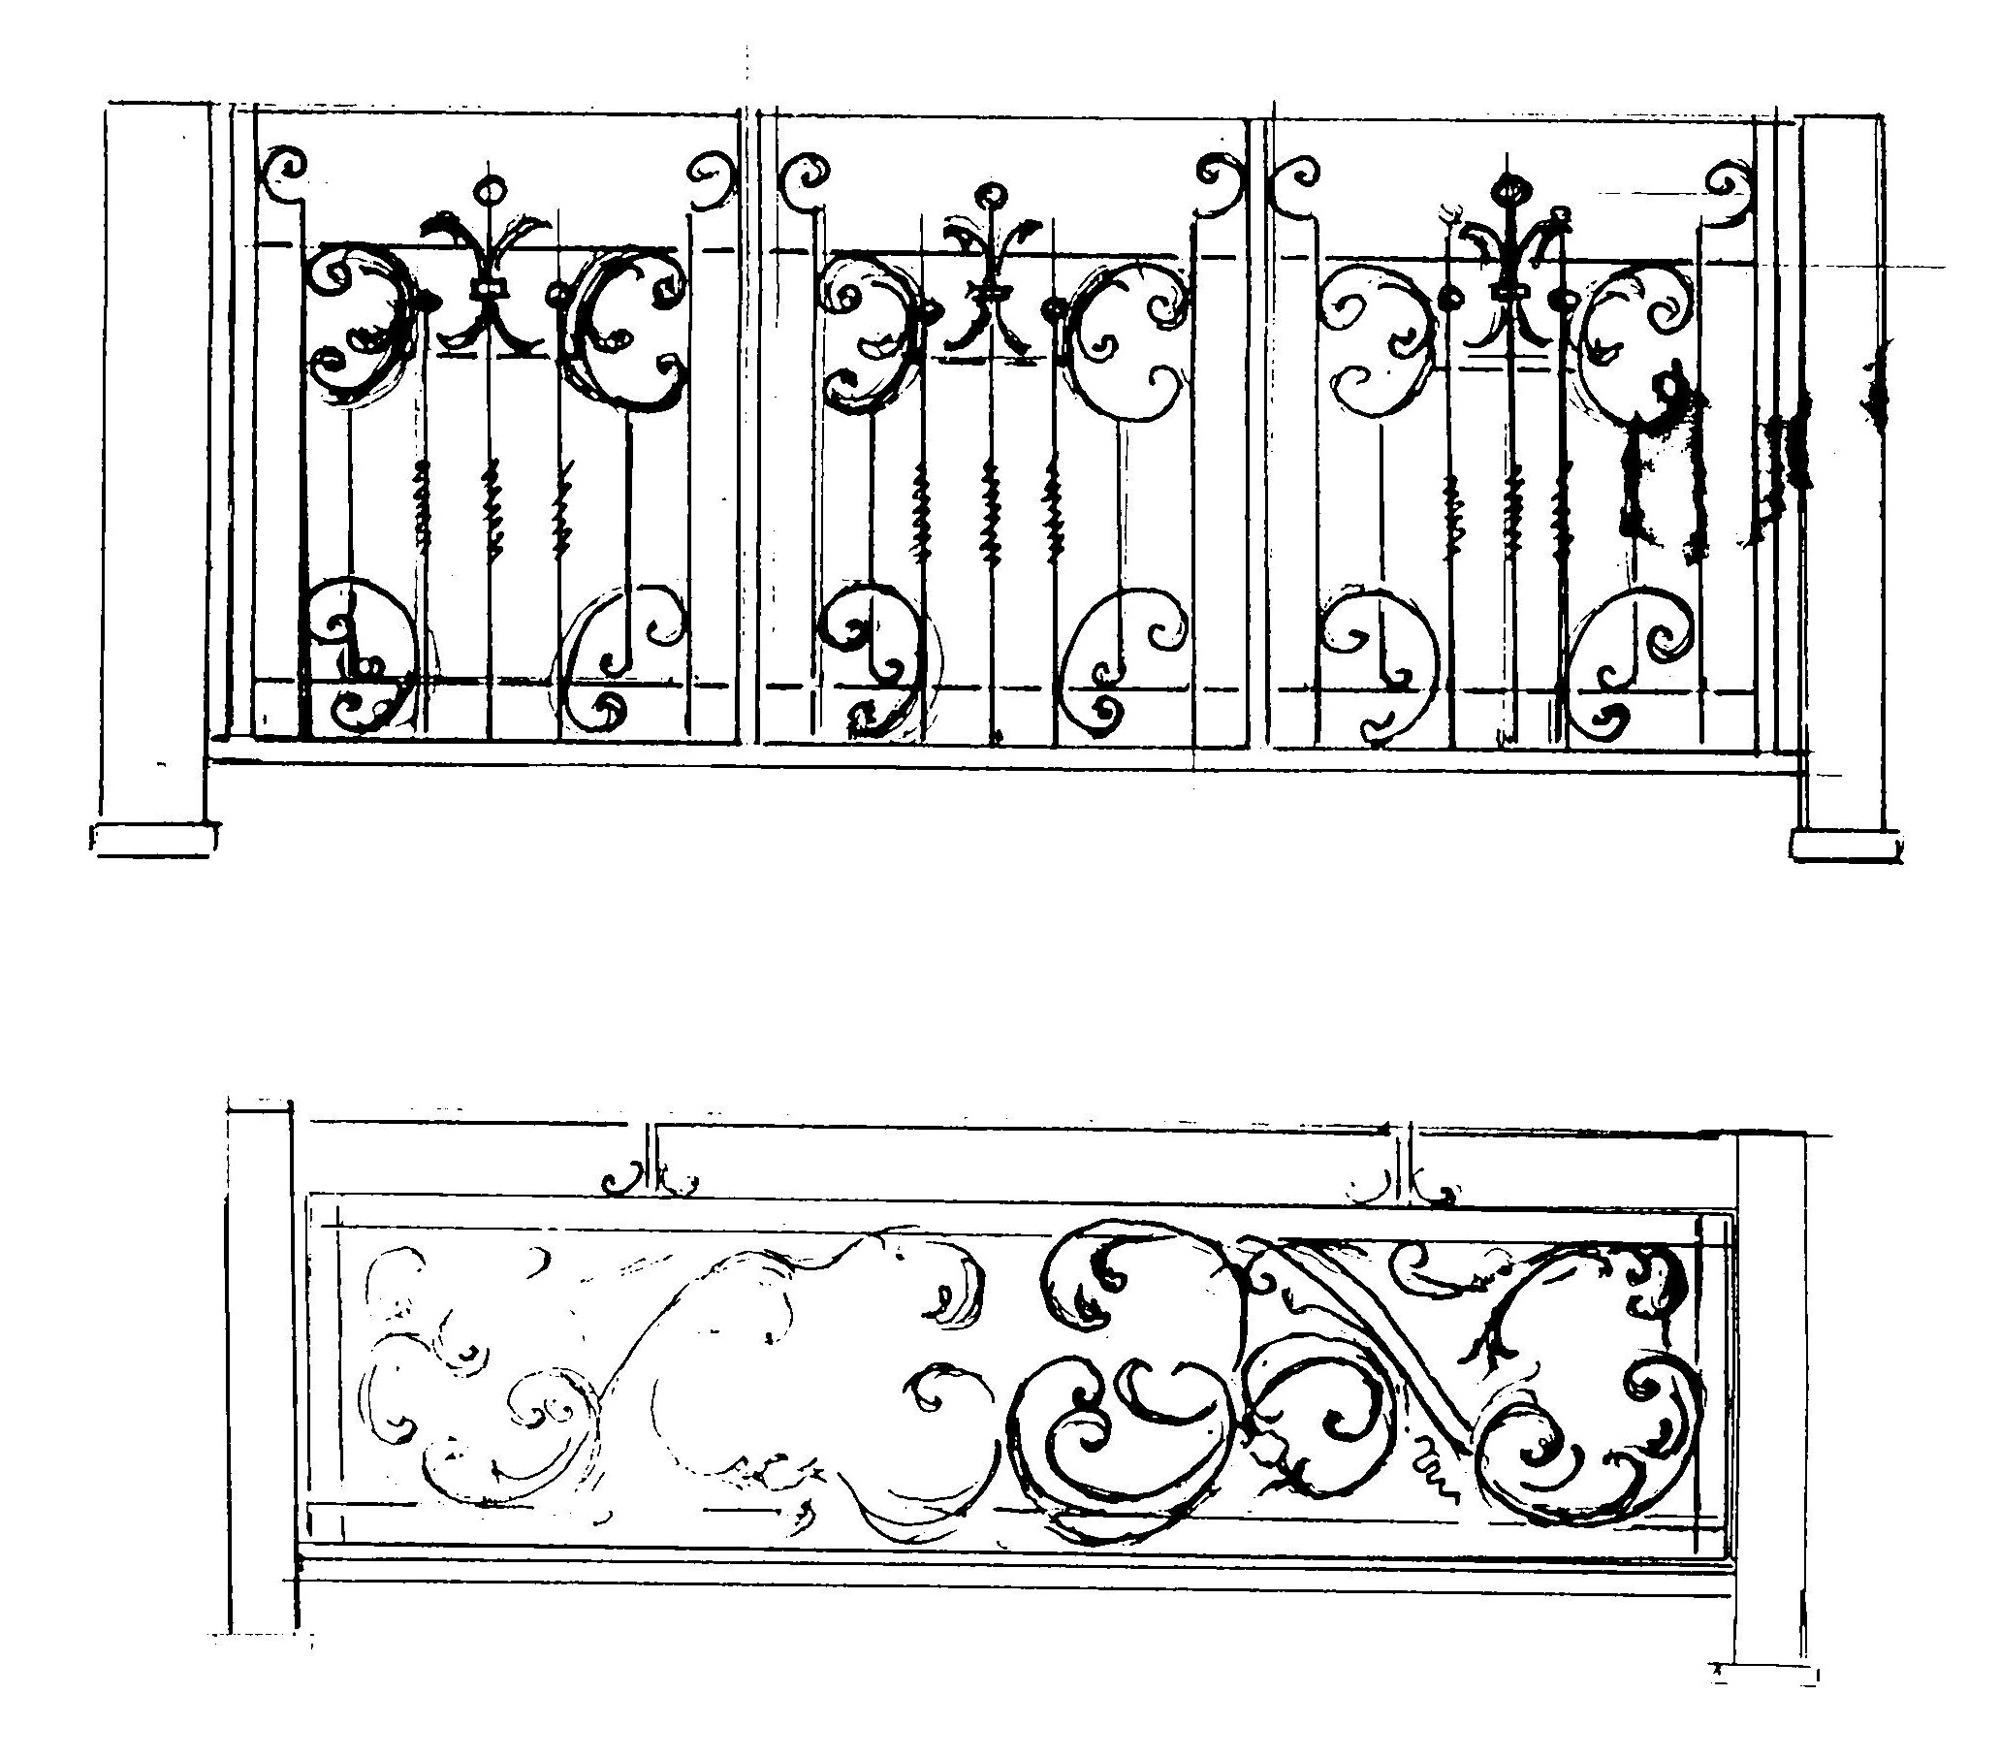 ритуальные ограды эскизы: